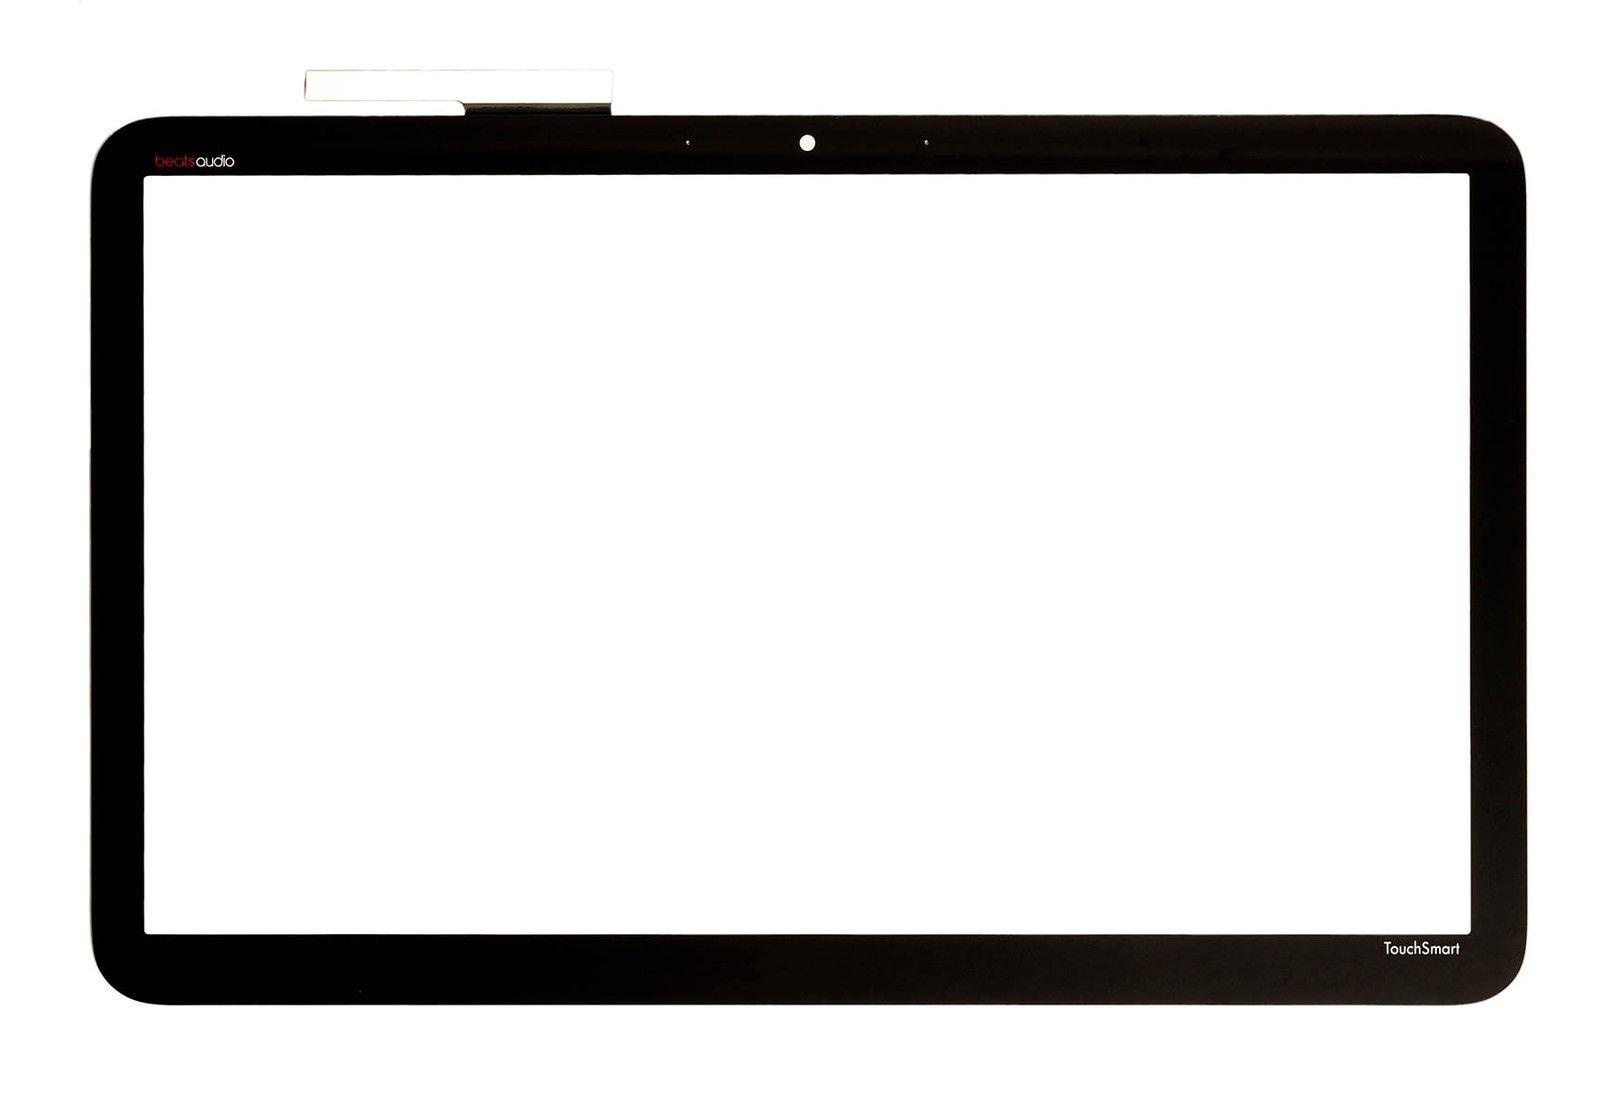 Free Shipping 15.6 Digitizer Glass Touch Screen for HP TouchSmart M6-N010DX M6-N012DX M6-N015D for hp pavilion touchsmart 11 series 11 e010au 11 e030ea 11 e030sa 11 e110nr 11 e019au touch screen digitizer sensor glass bezel